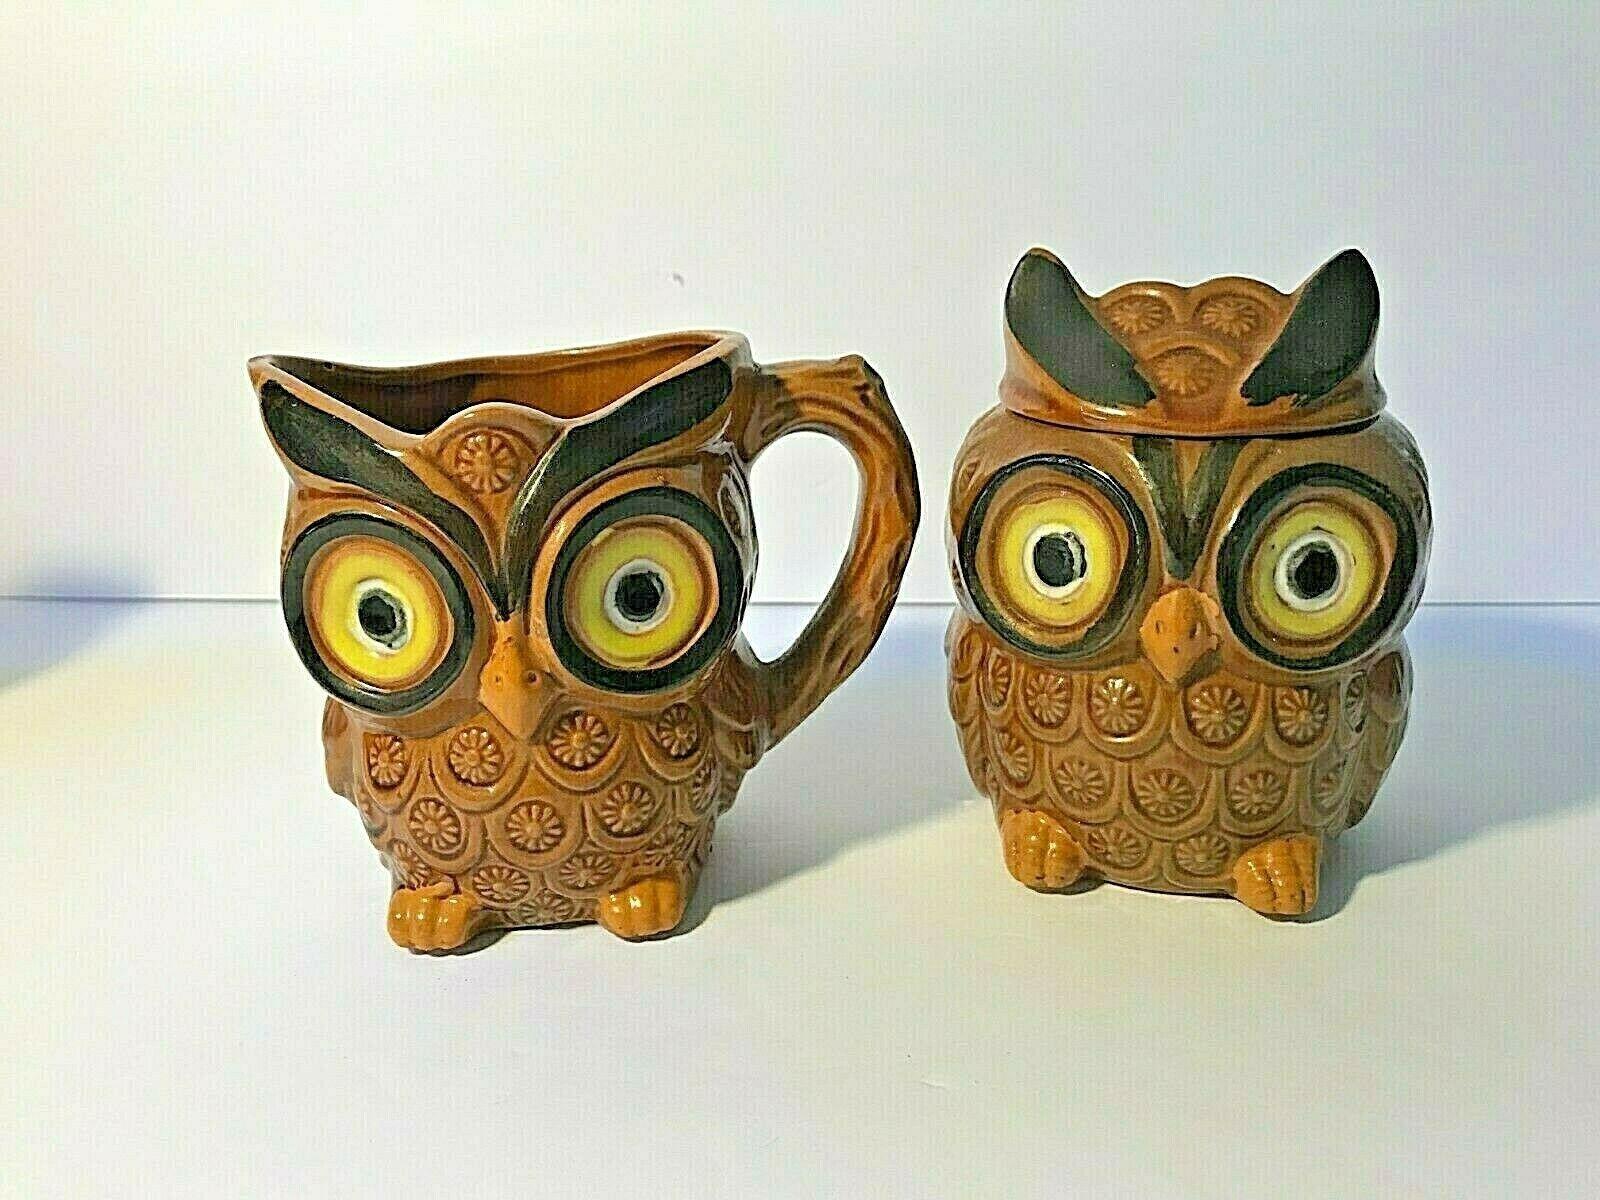 Vintage Set of Four Owl Table Set Salt and Pepper Creamer and Sugar Bowl